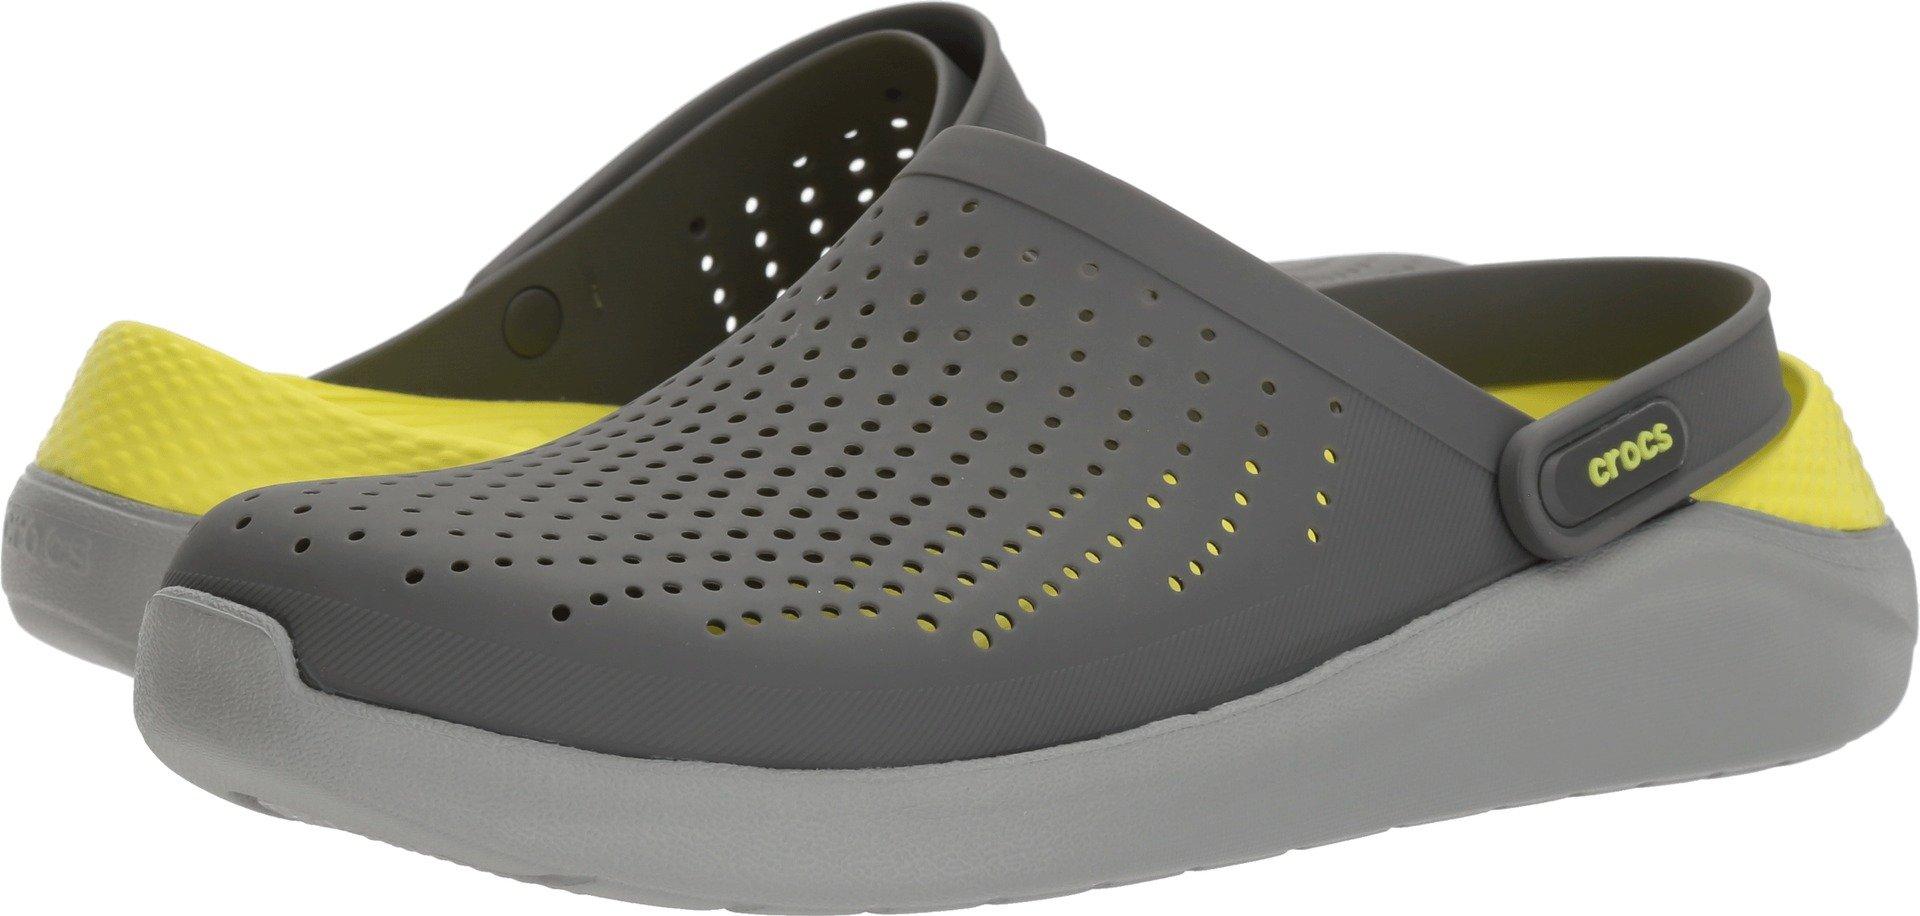 Crocs Unisex LiteRide Clog, Slate Grey/Light Grey, 9 US Men/11 US Women M US